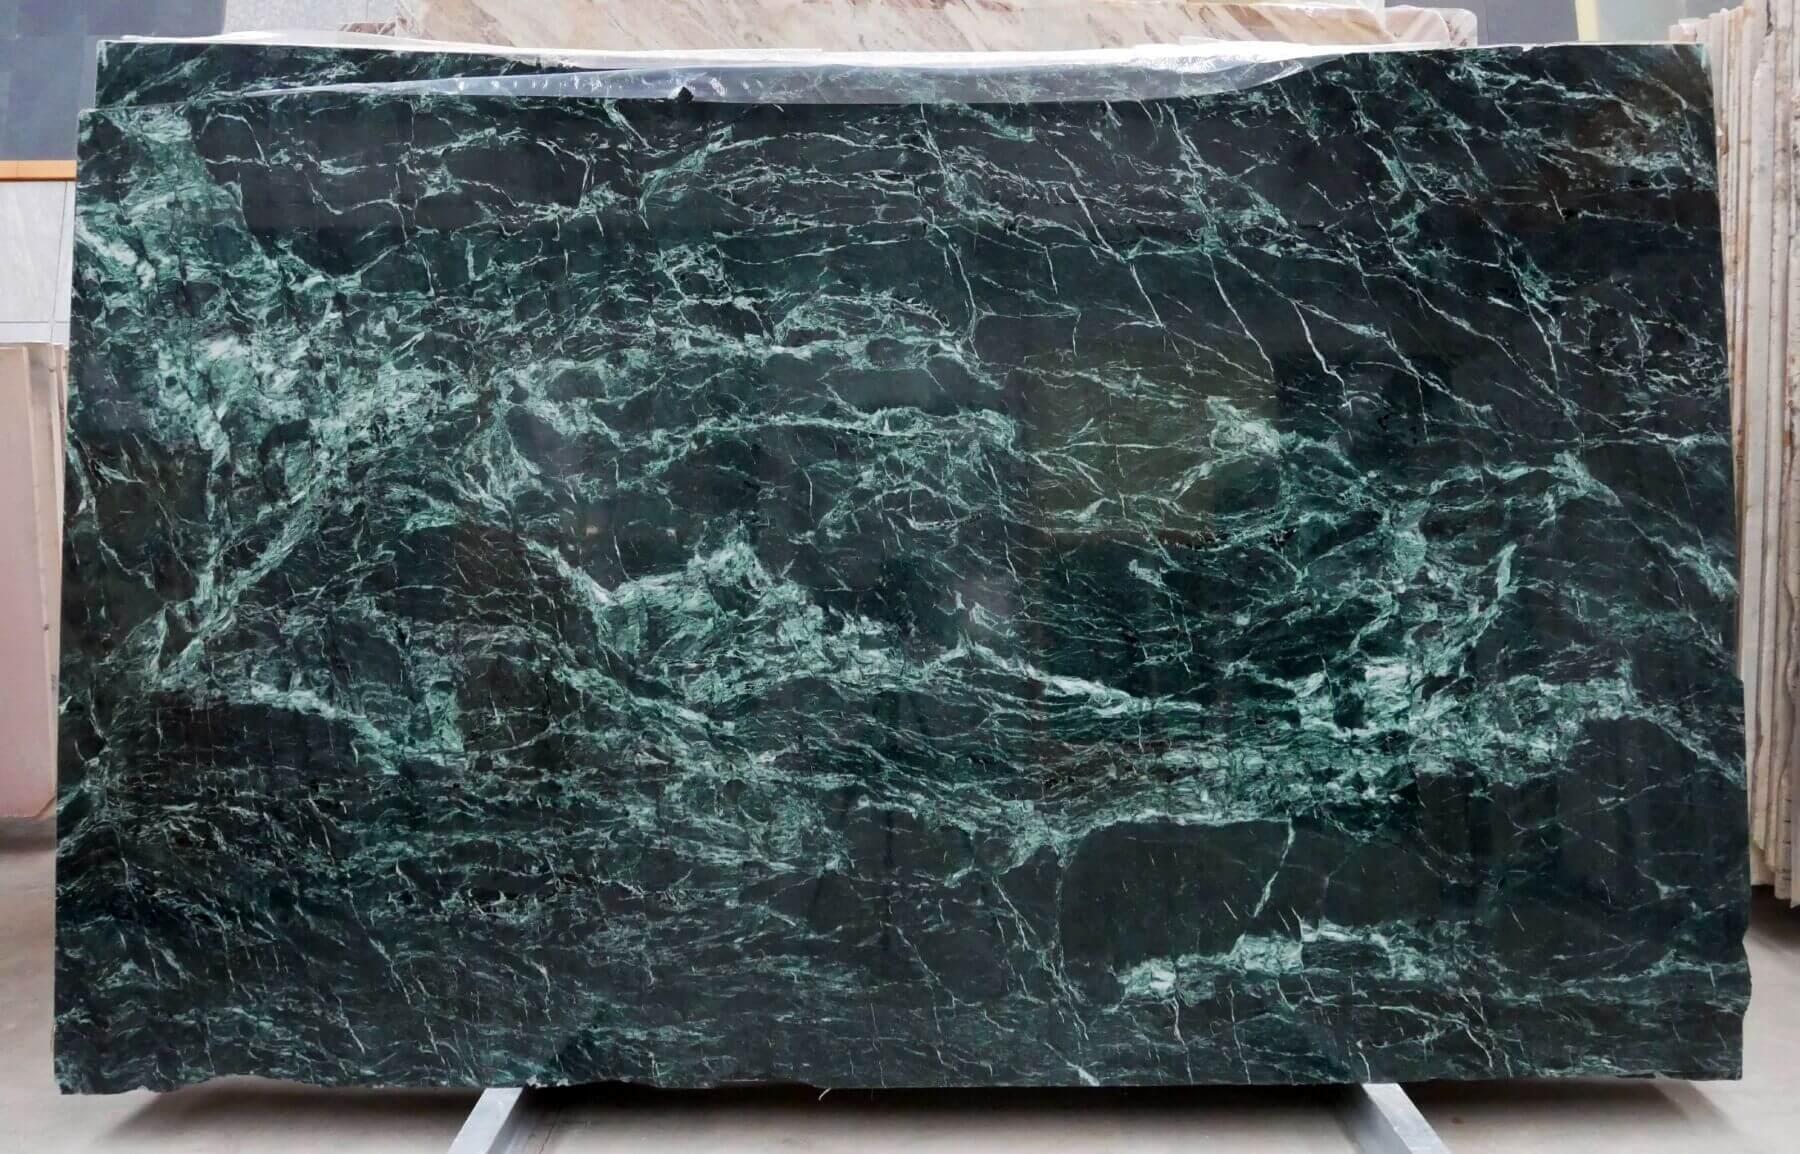 12748 223-277x140-162x2cm 42 polished sl